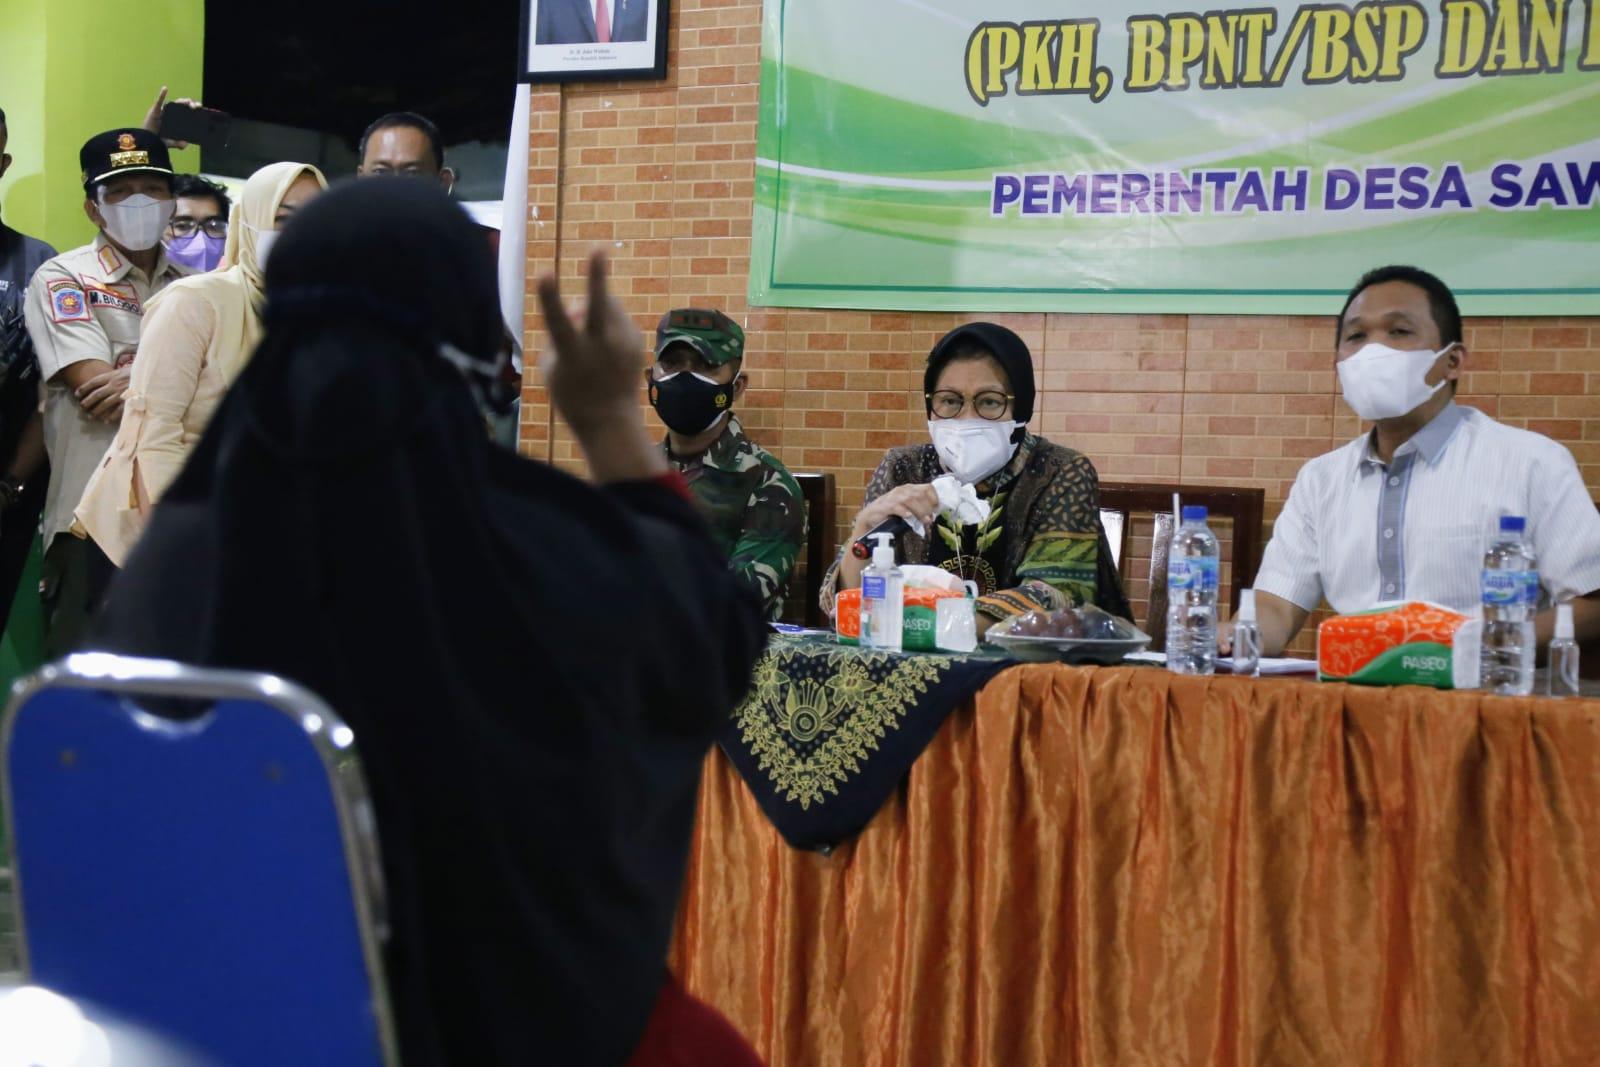 Mensos Risma Dengarkan Aspirasi KPM PKH di Posko Pengaduan Bansos di Lumajang